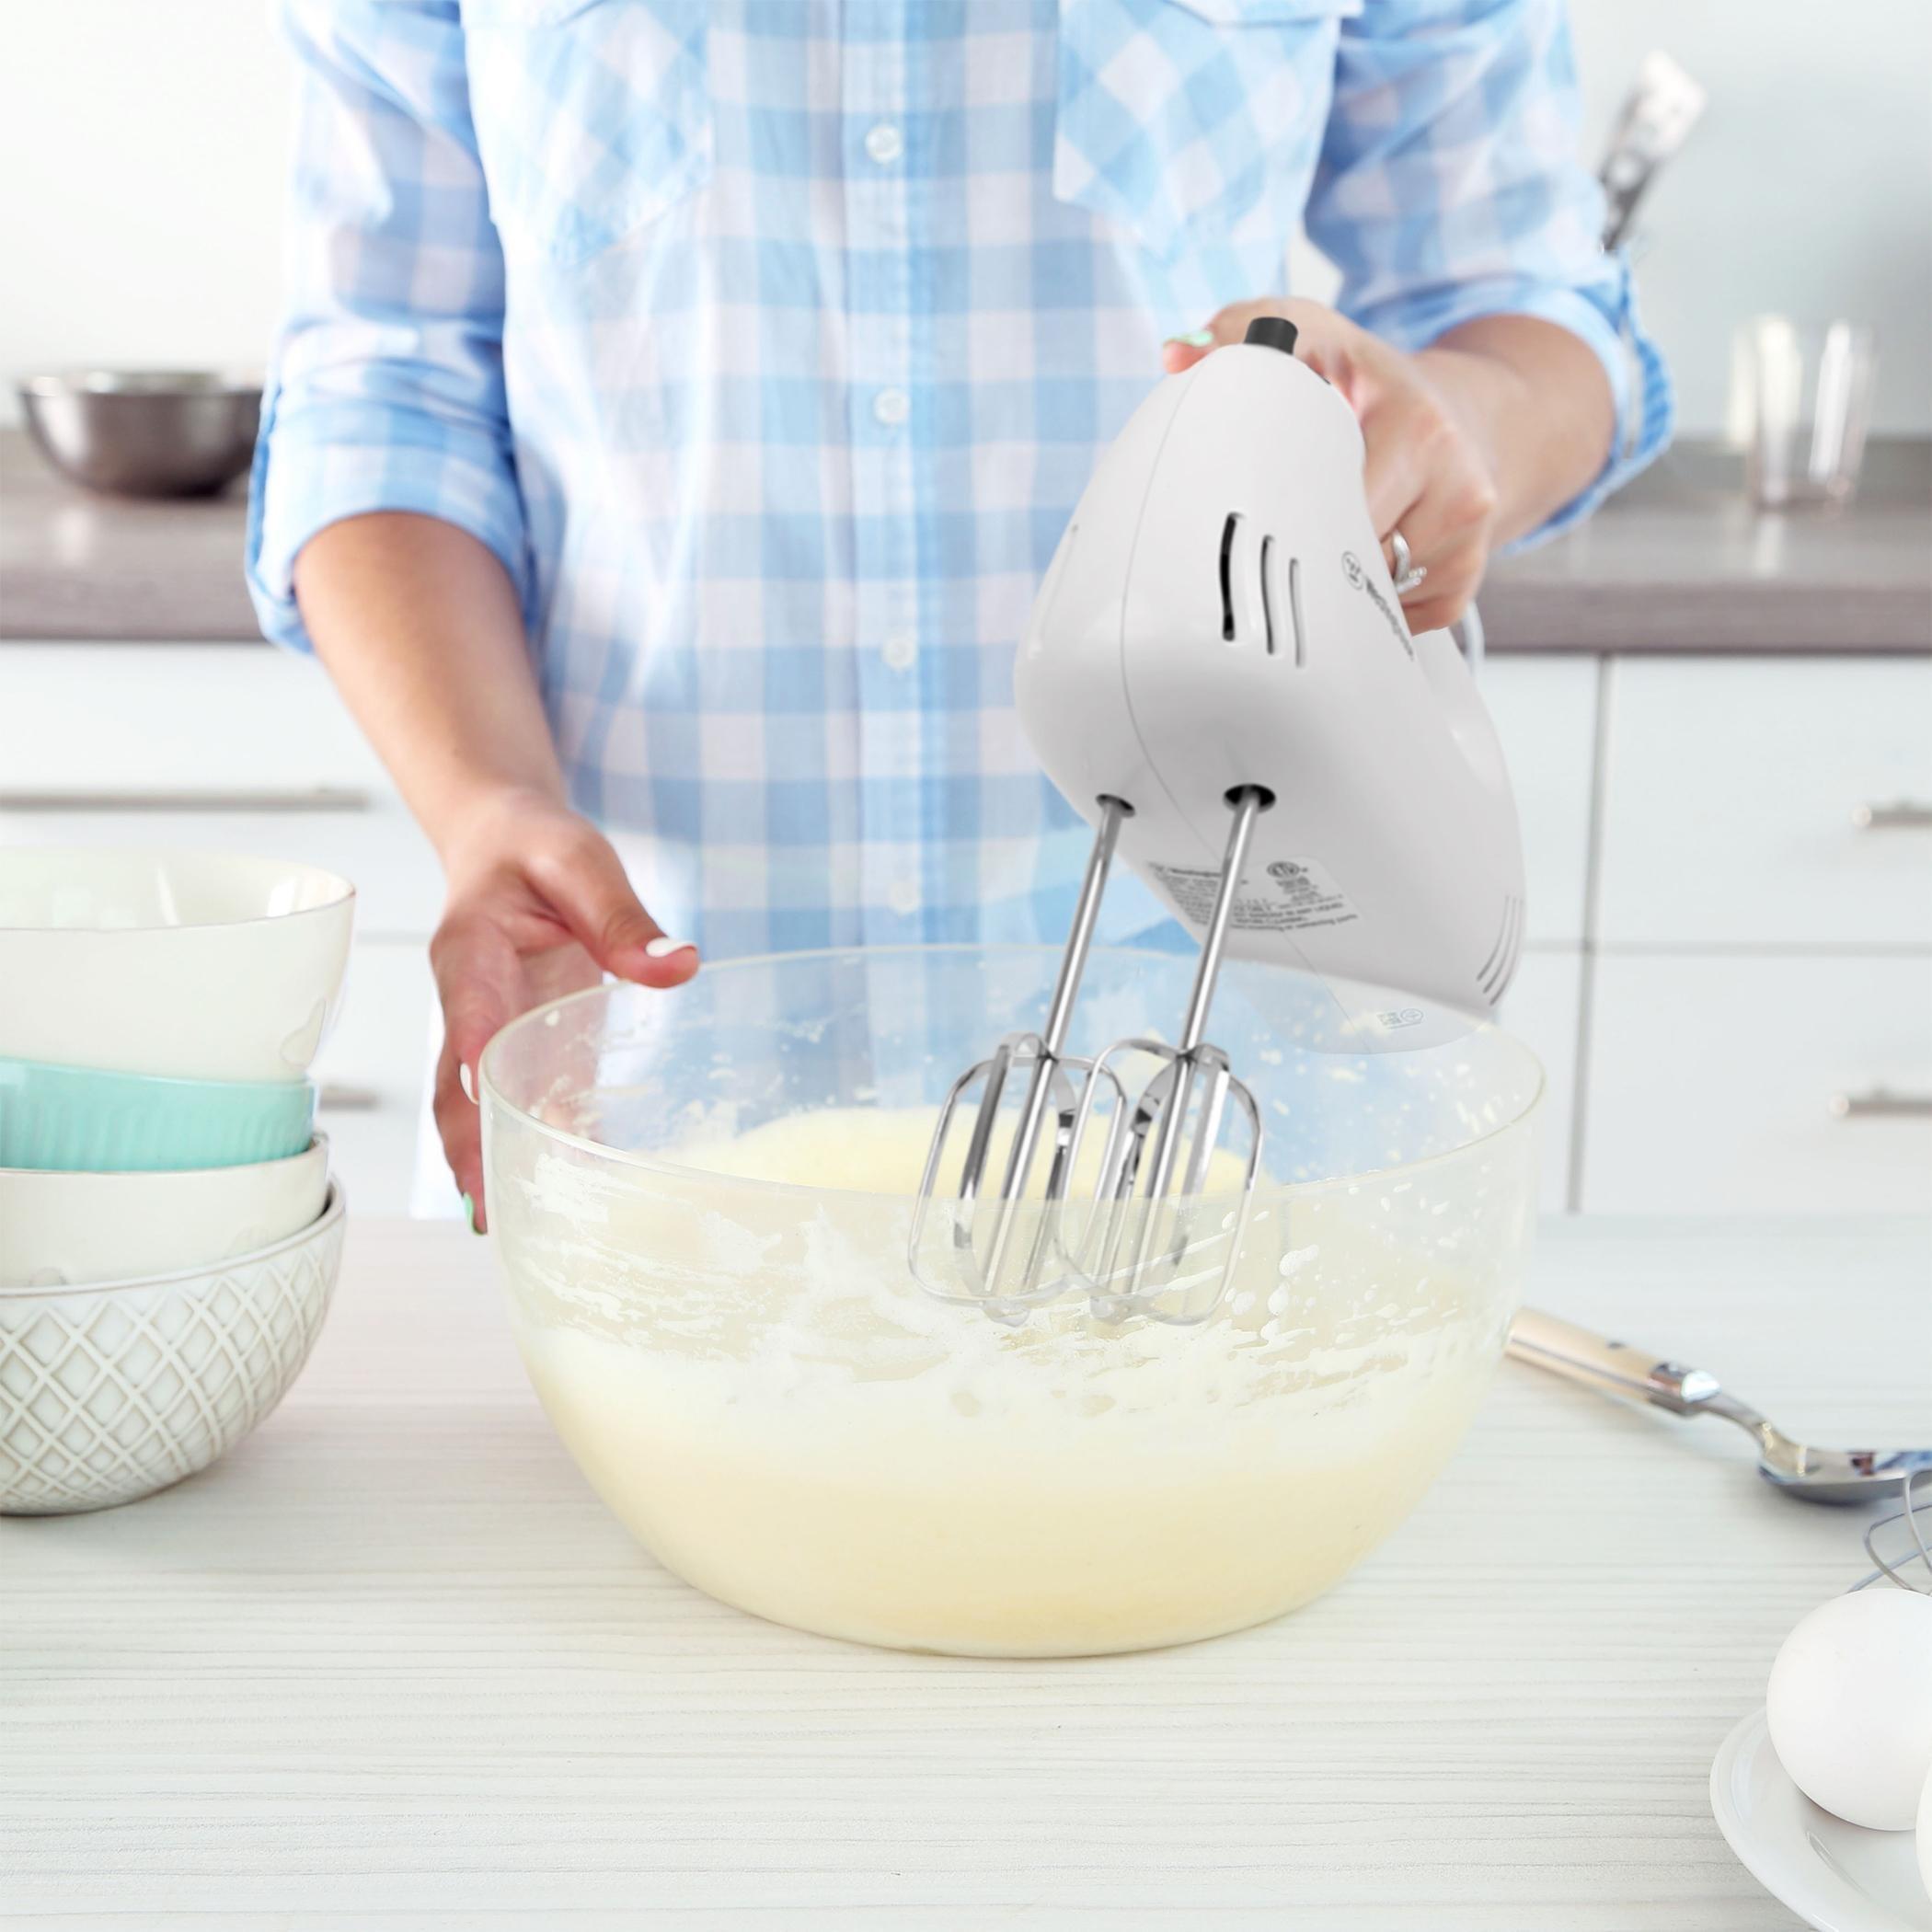 Westinghouse COMIN18JU013296 Whm5Wa Select Series 5 Speed Hand Mixer White